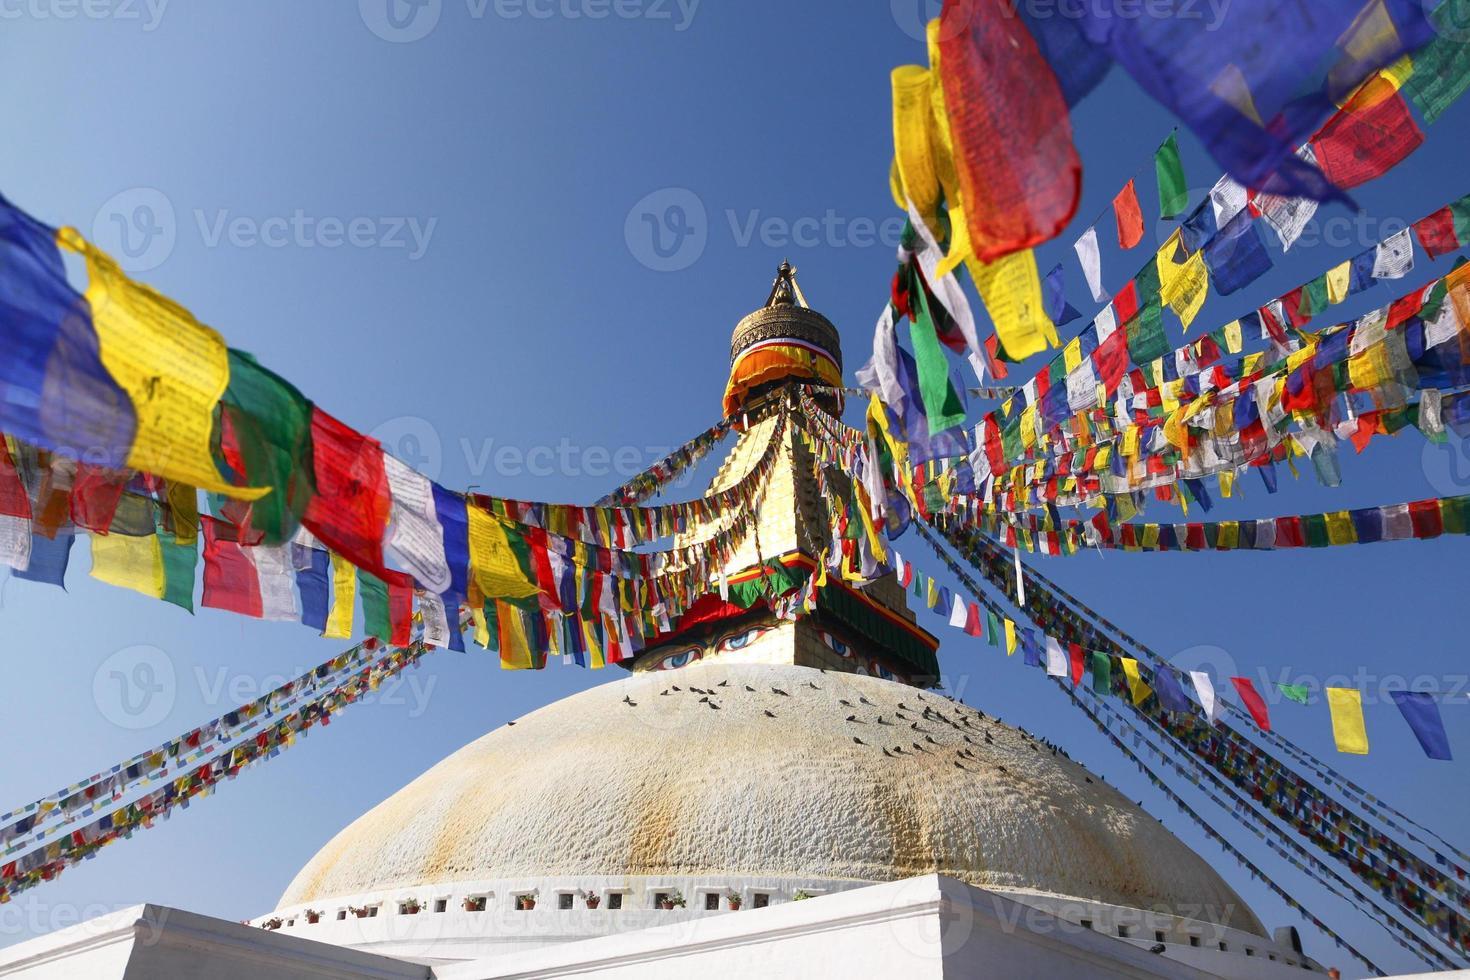 Bodhnath stupa with colorful flags in Kathmandu, Nepal photo